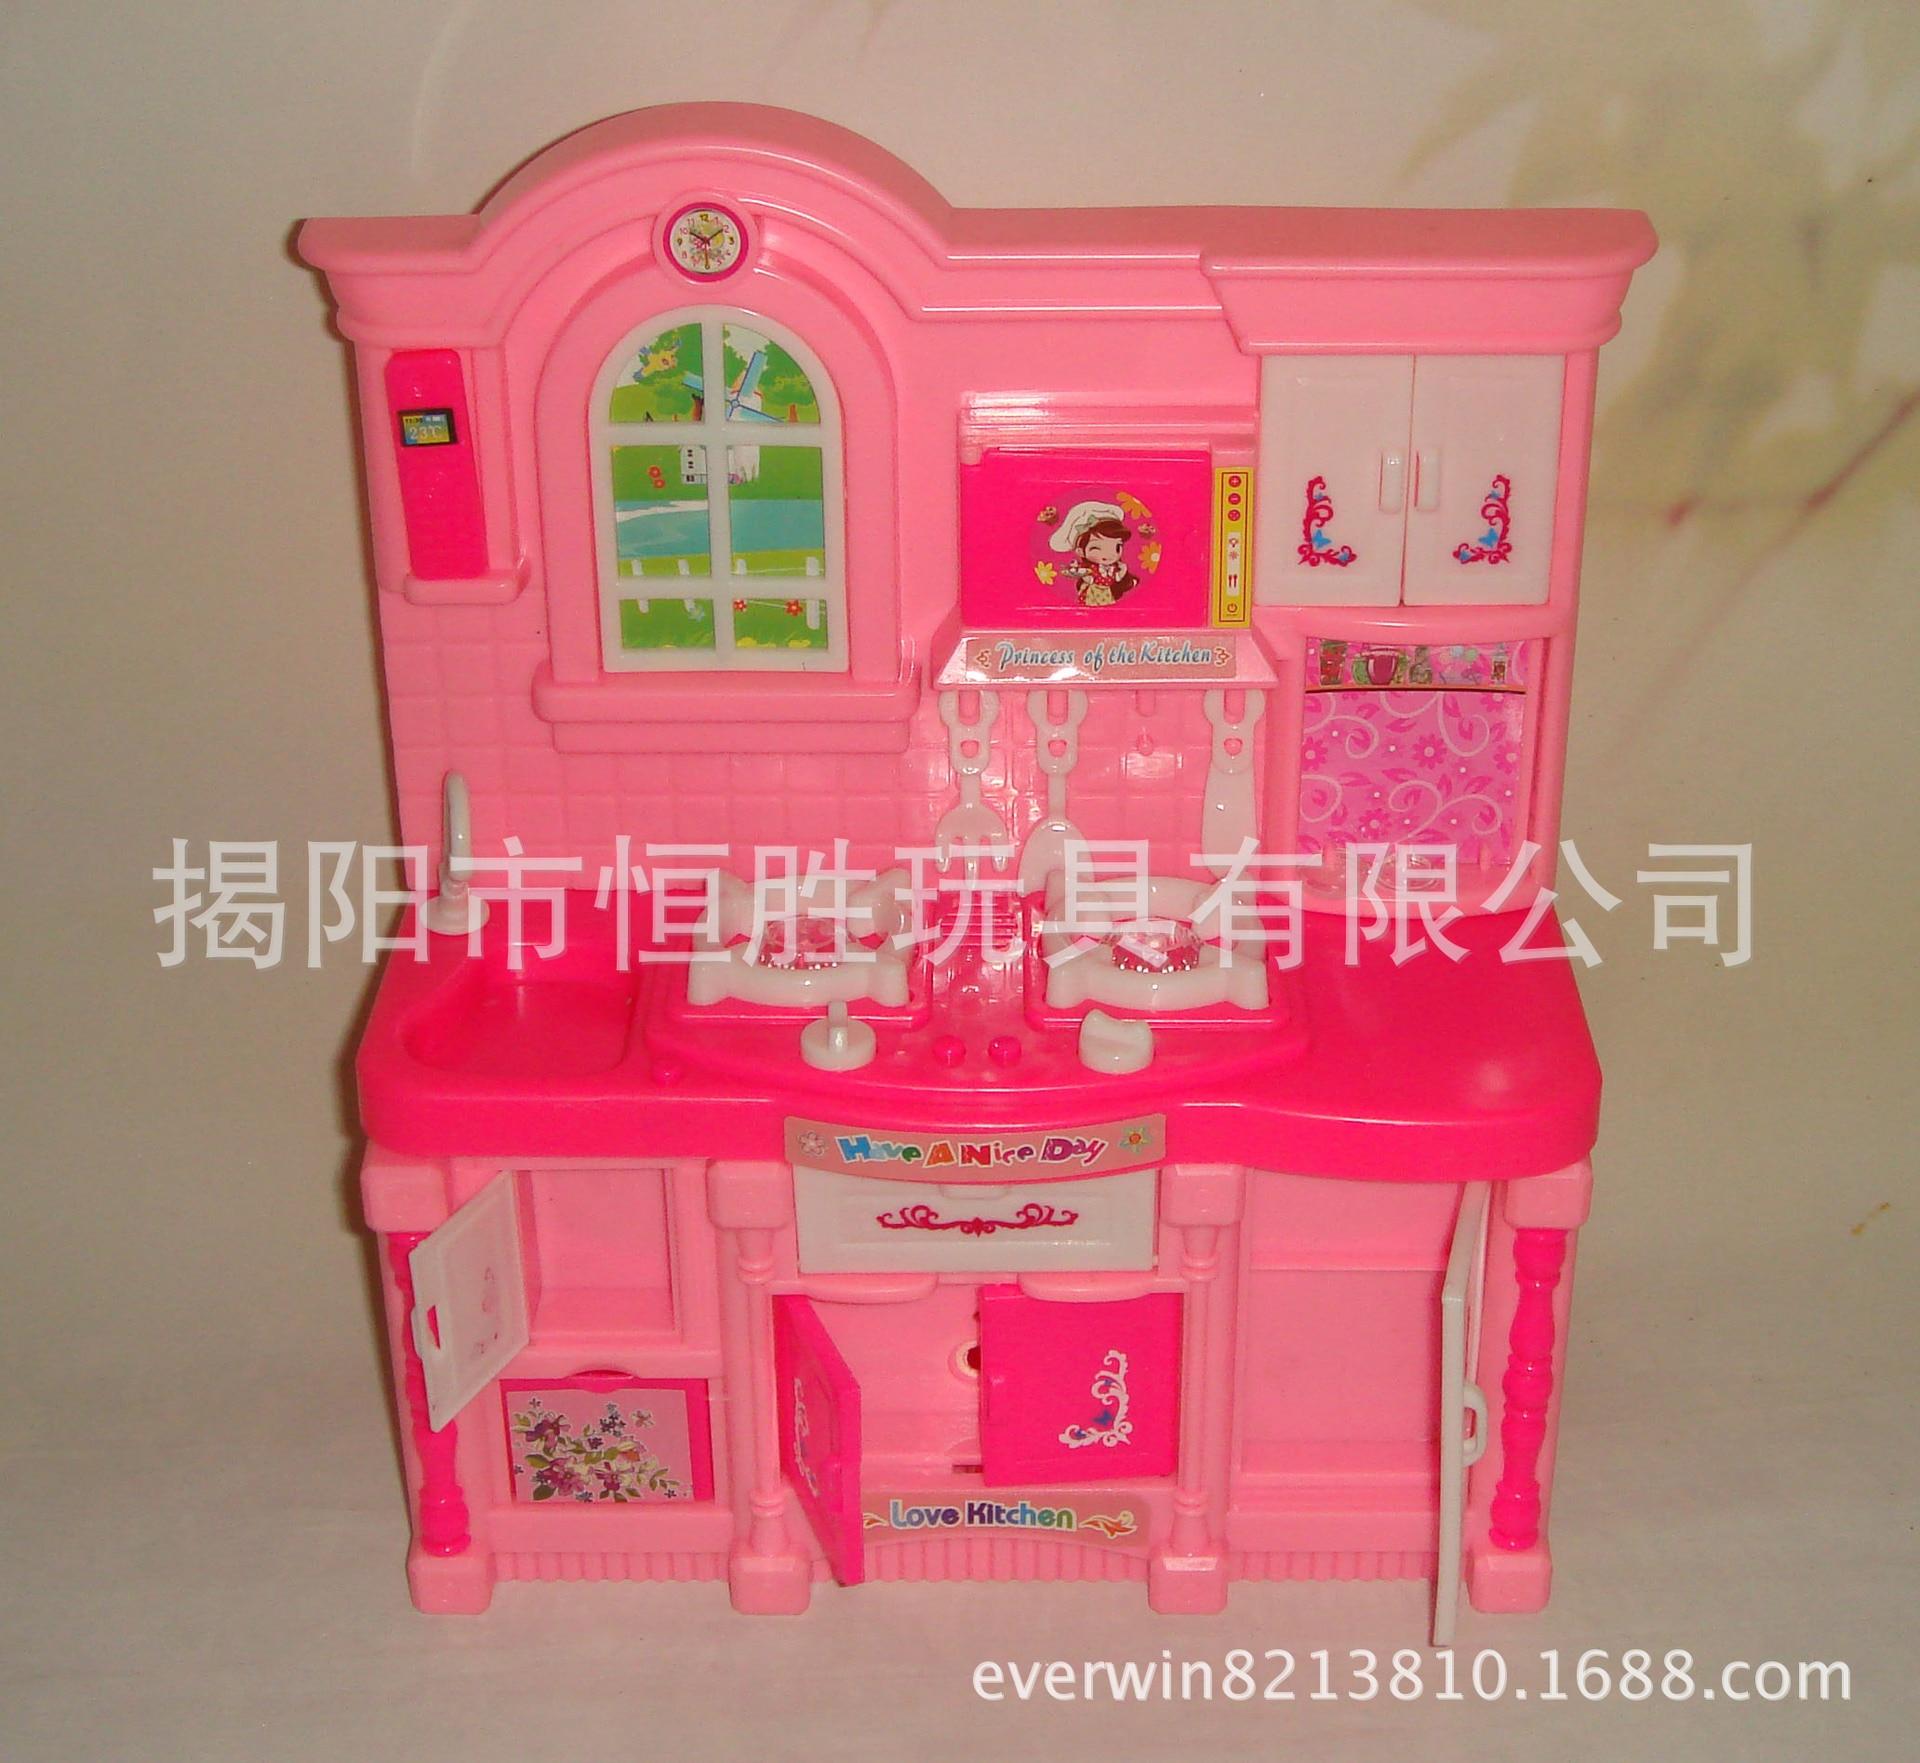 bambini play house toys simulazione set di mobili da cucina per barbie accessori ragazza cook cooking